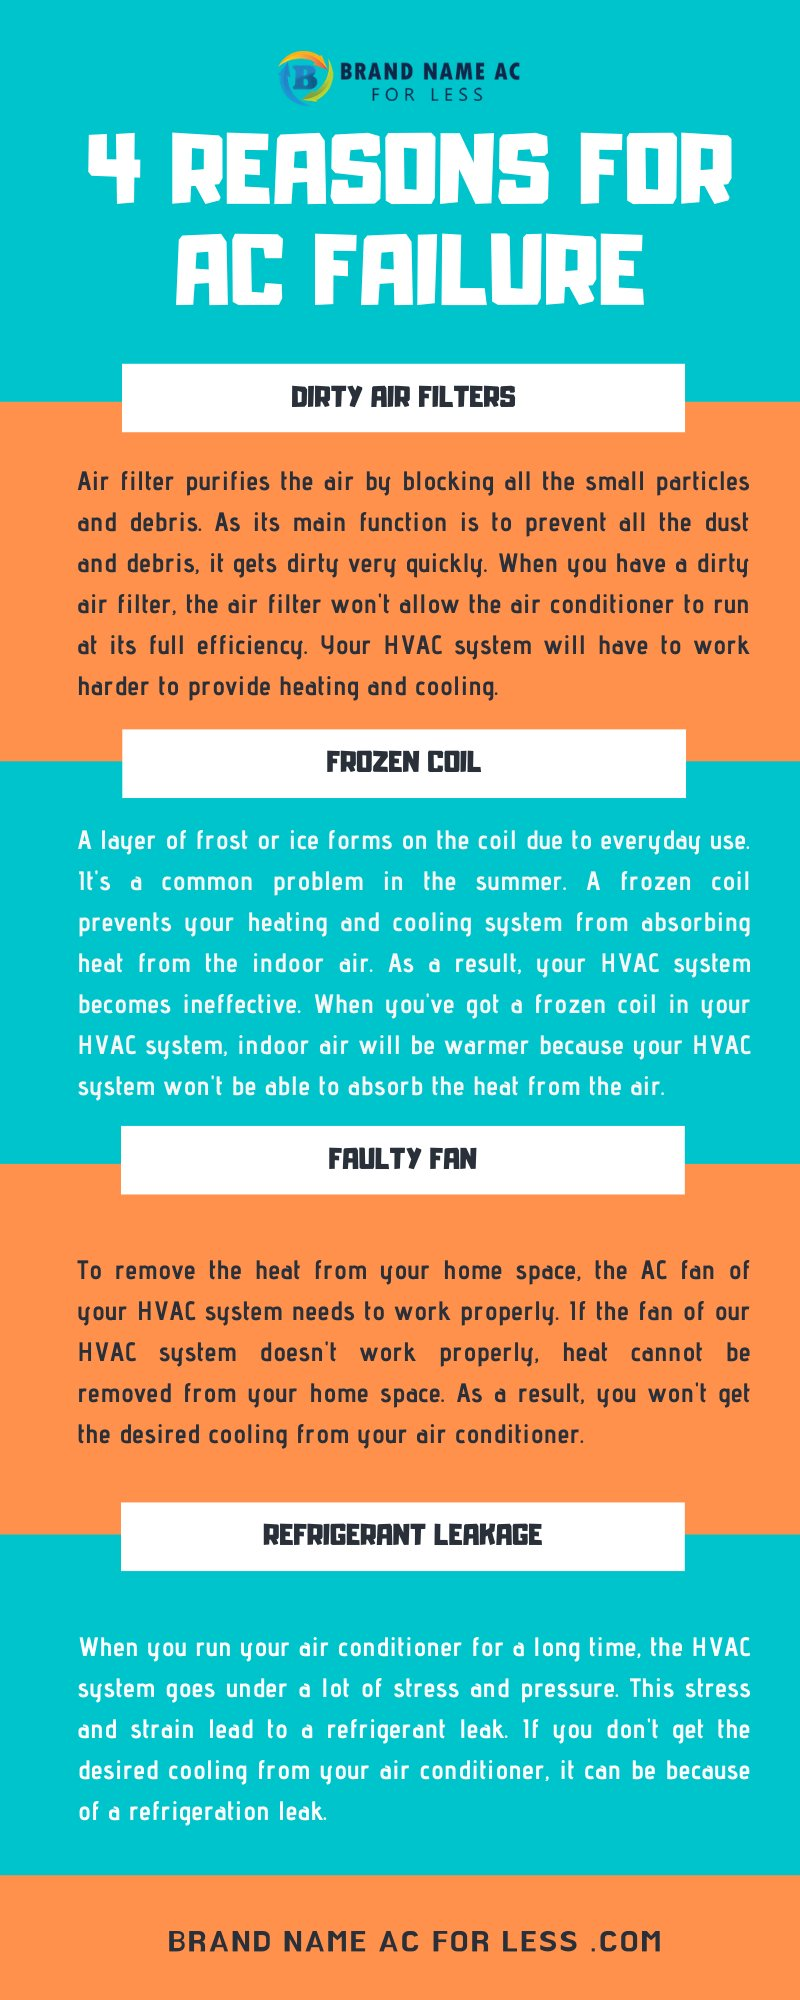 4 Reasons for AC failure